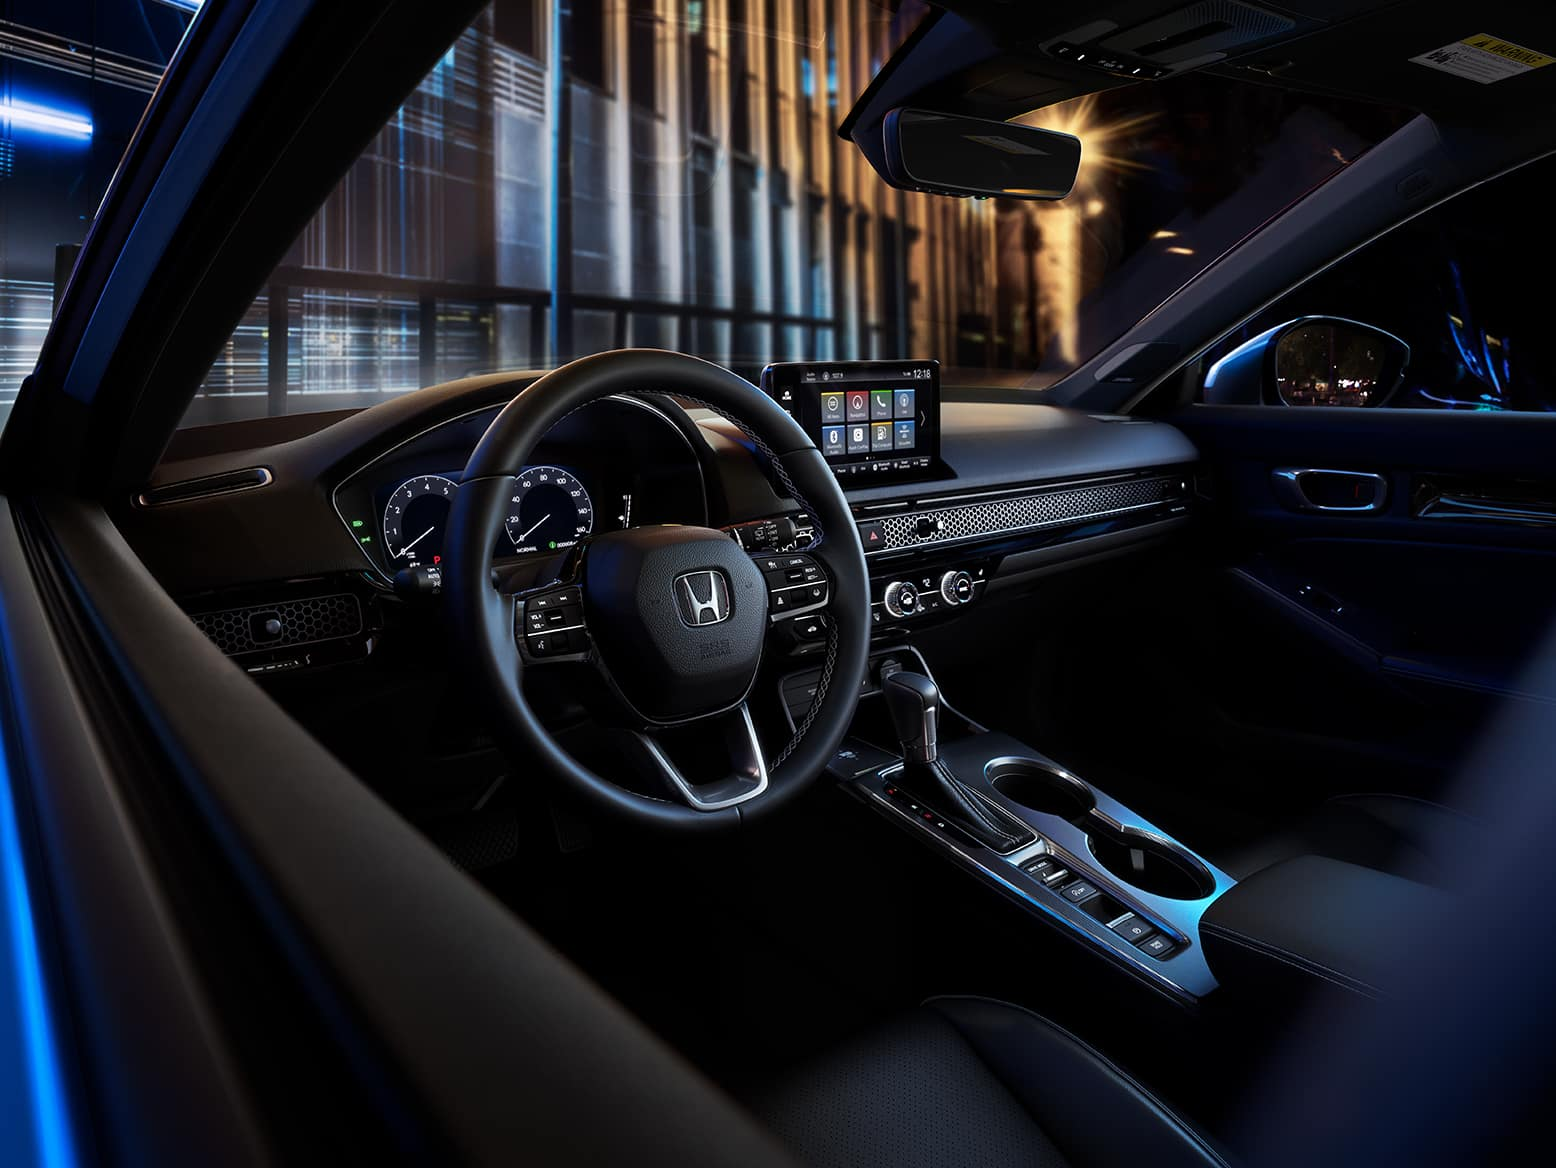 2022 Honda Civic with remote start engine